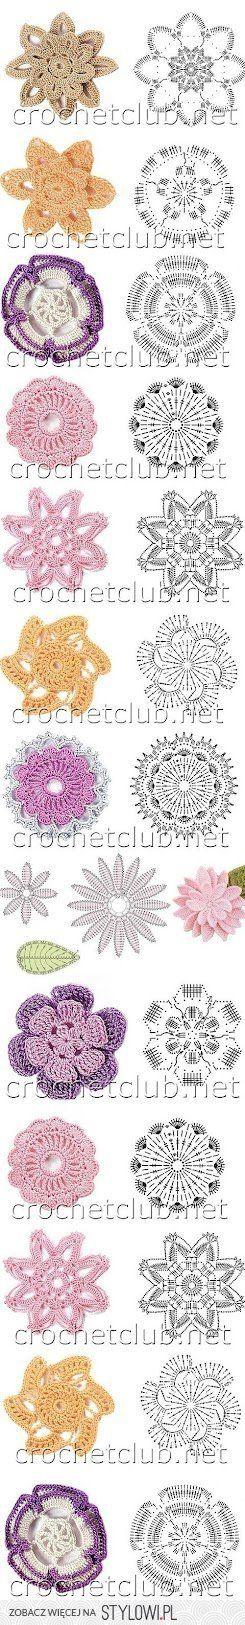 Receitas de Crochet na Stylowi.pl